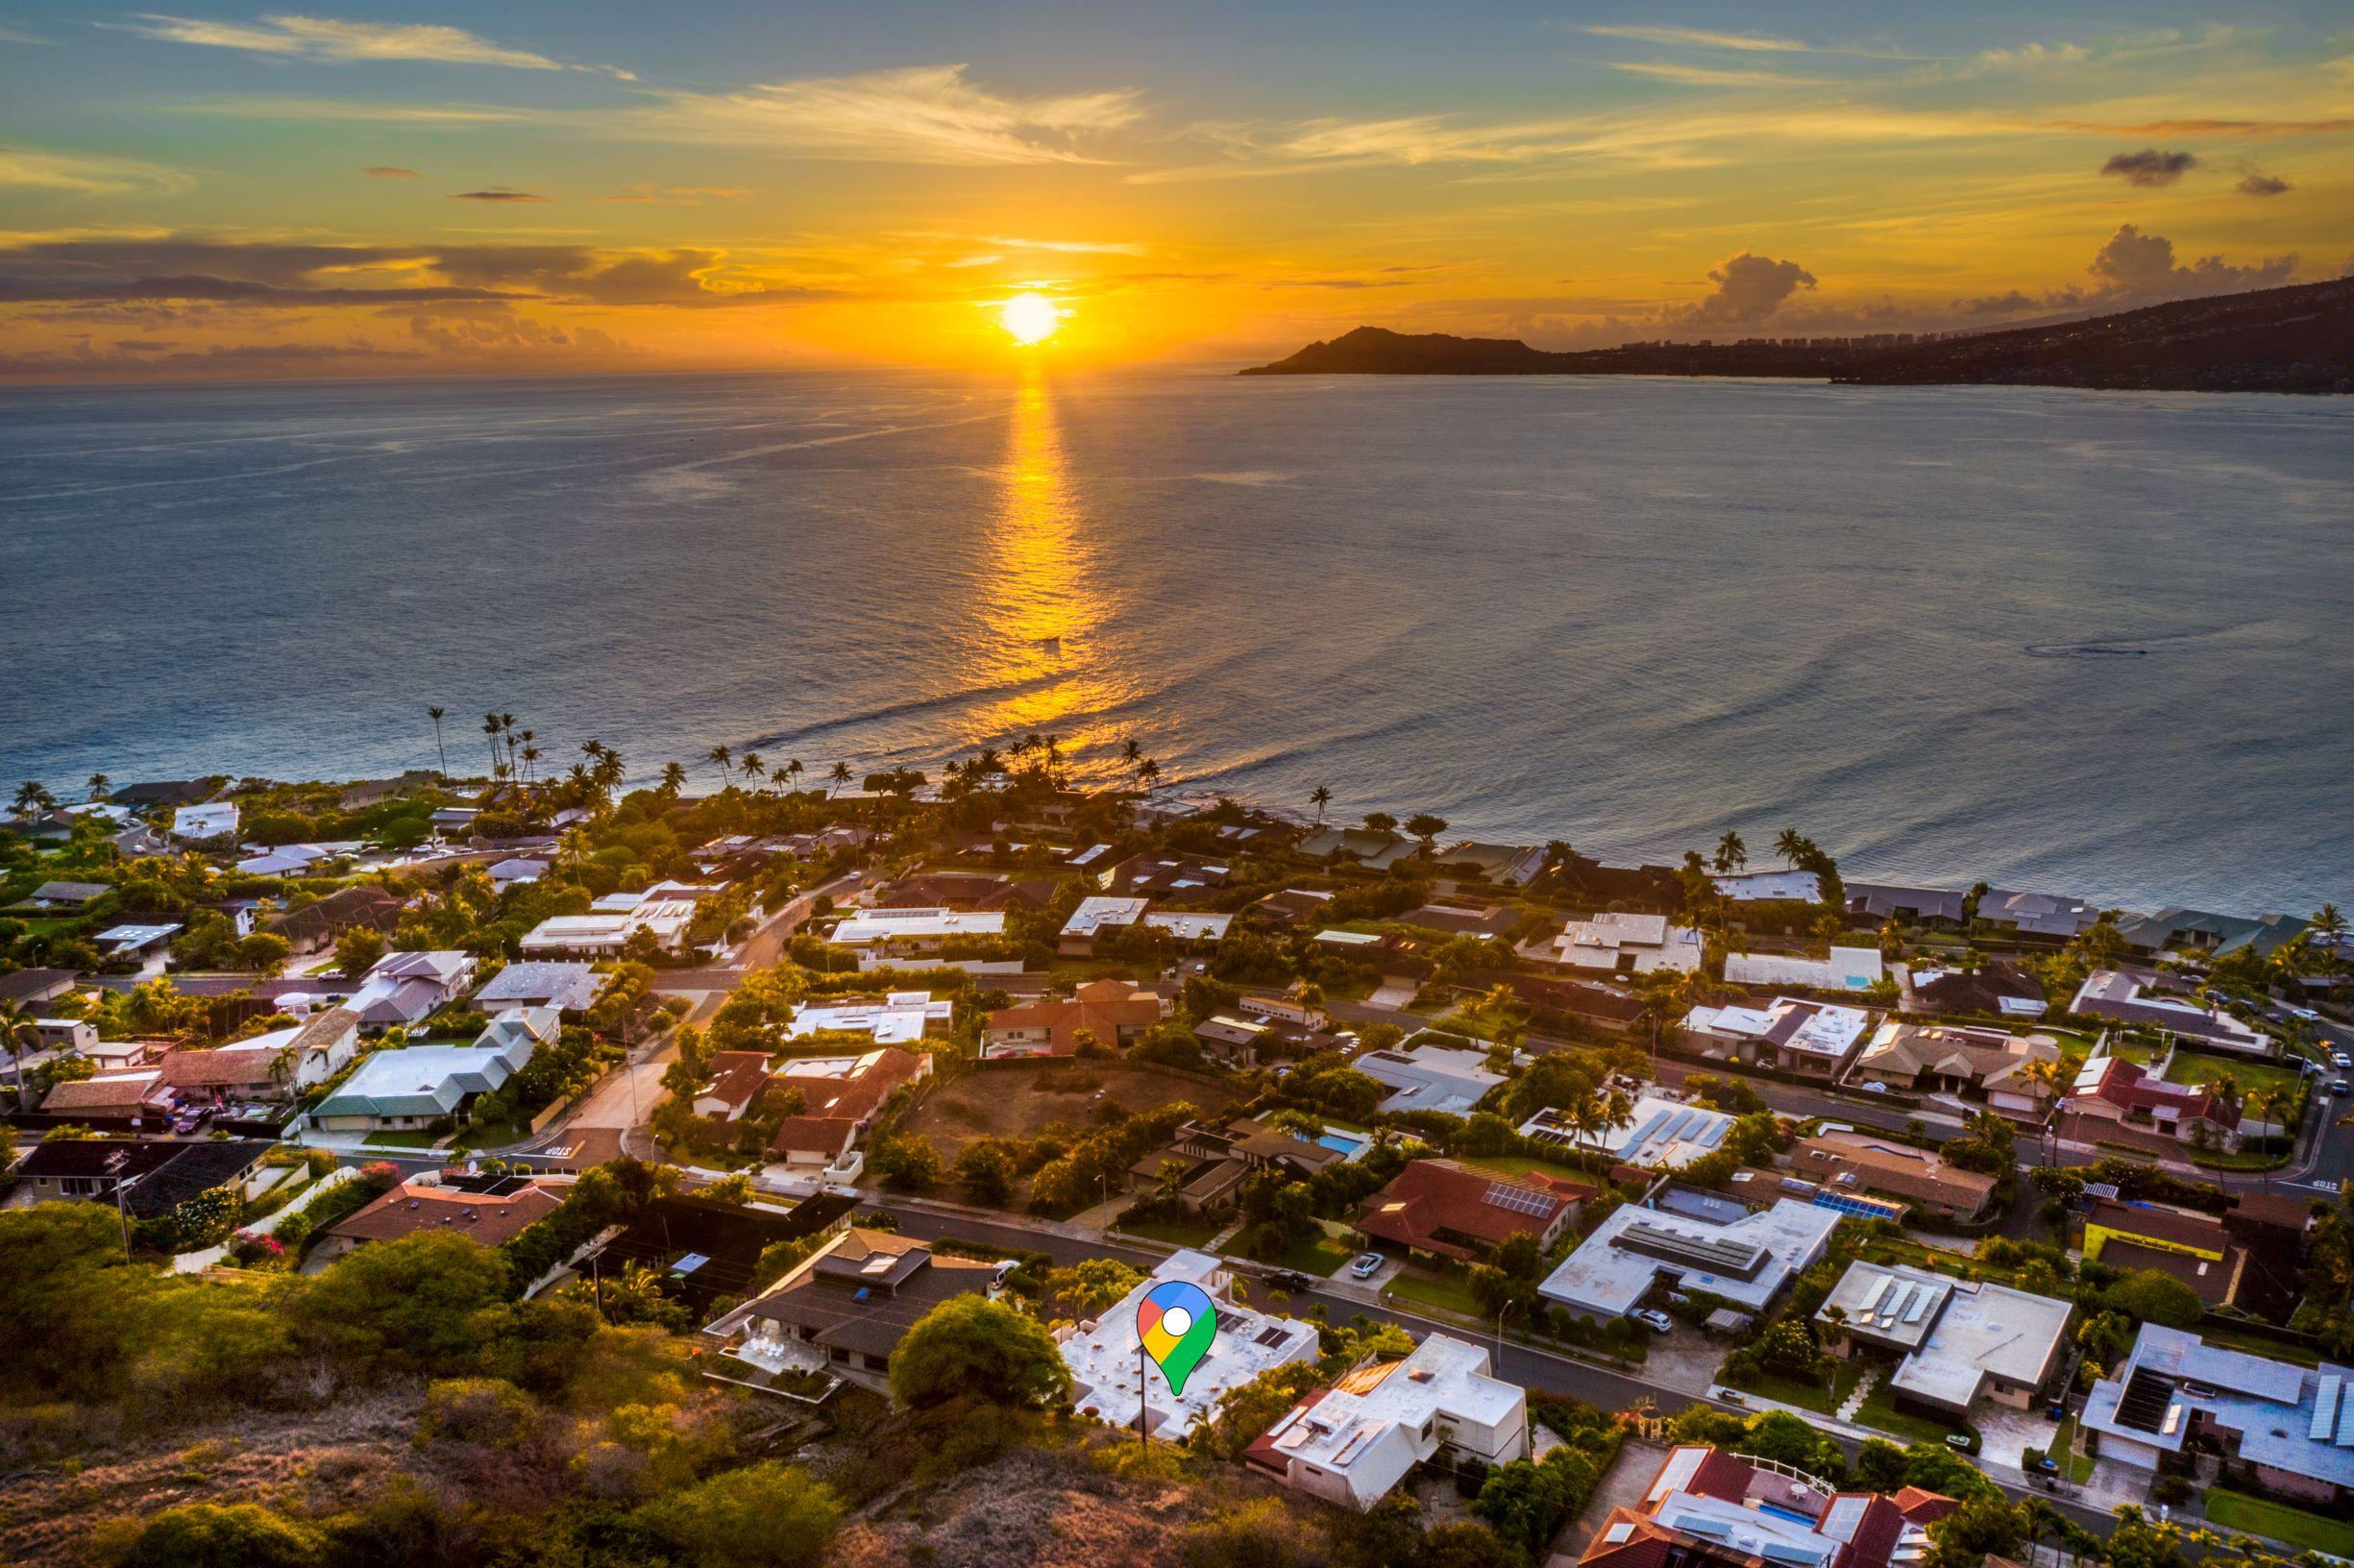 Sunset Aerial View at 113 Lumahai Street